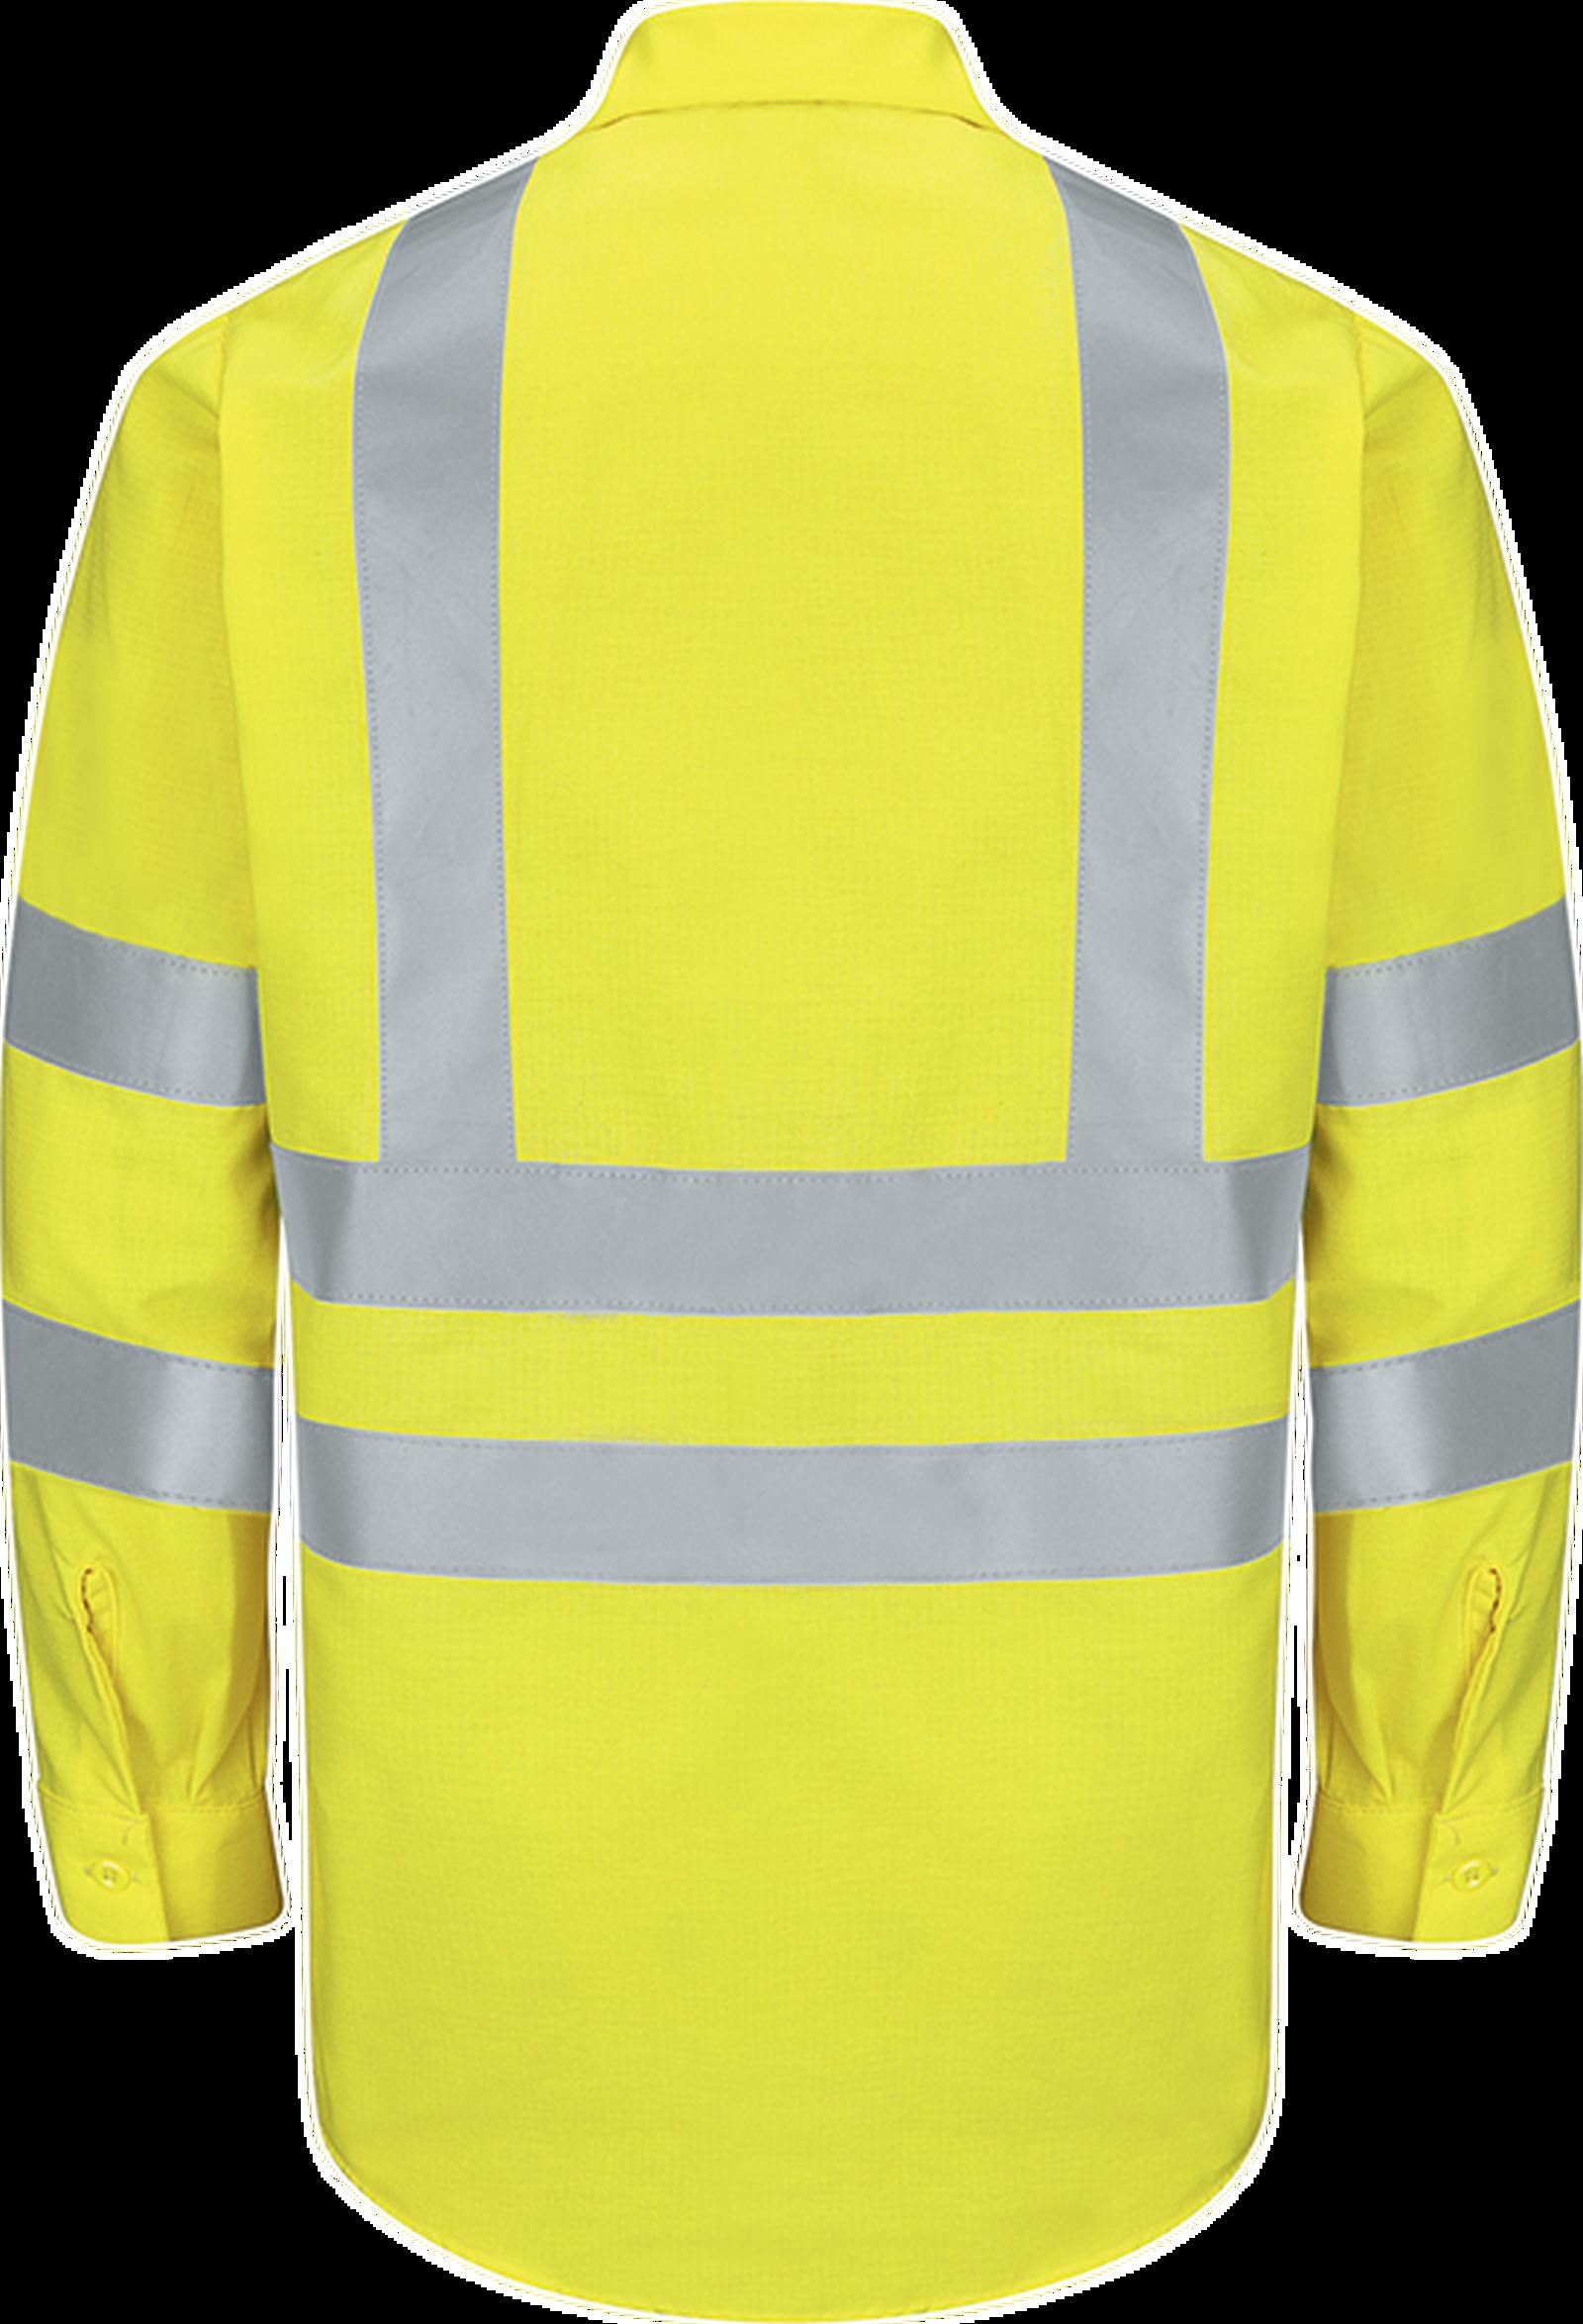 Men's Hi-Visibility Long Sleeve Ripstop Work Shirt - Type R, Class 3